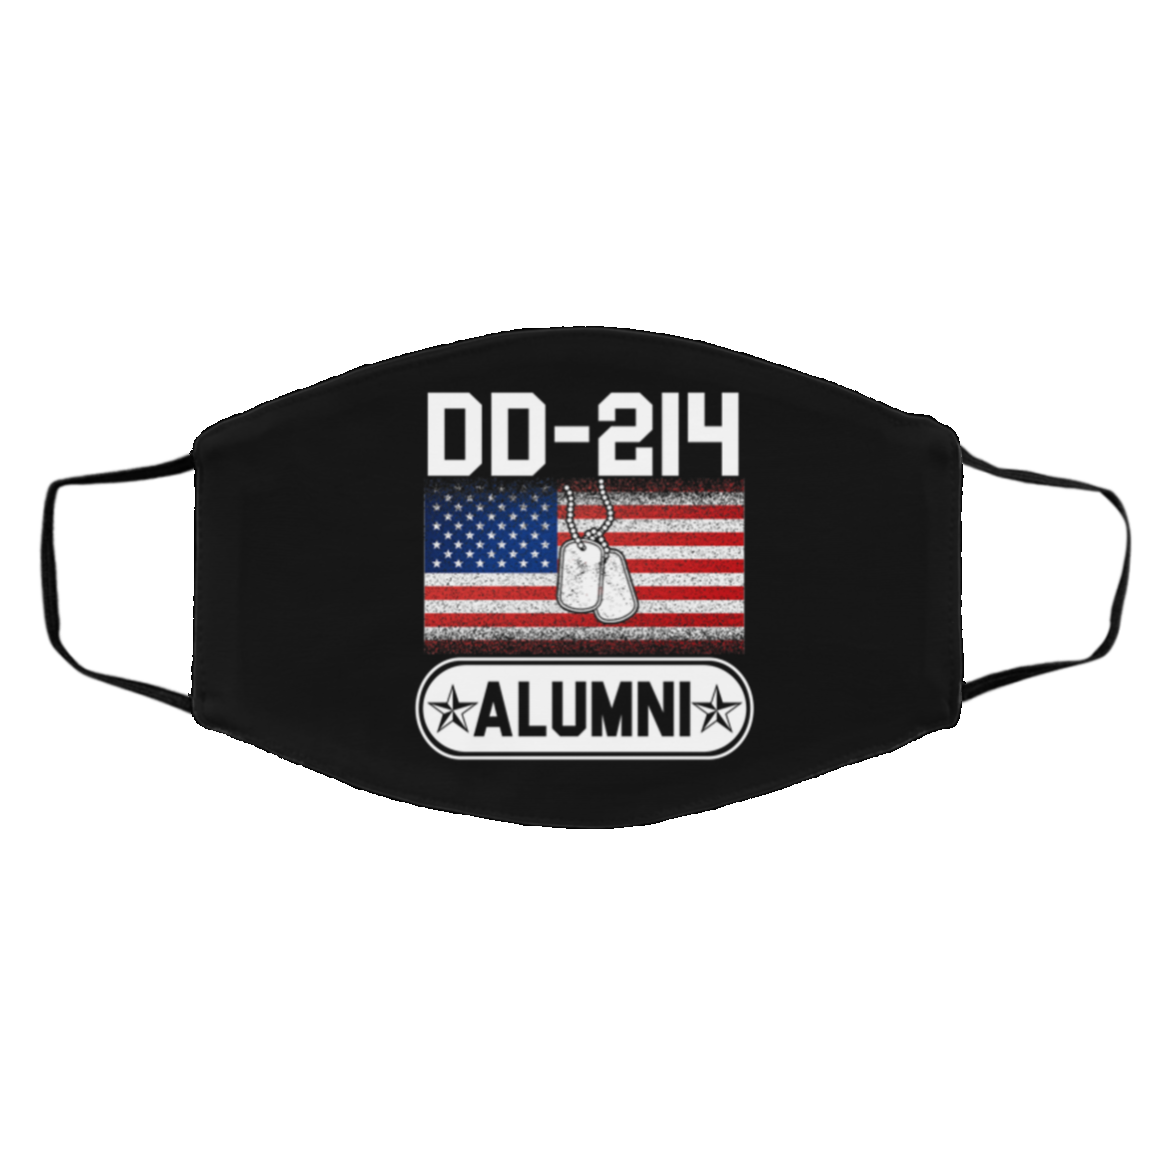 DD-214 Alumni Veteran I Haved Served Resuable Washable Custom Printed Face Mask, Black, Cloth Face Cover – Medium/Large